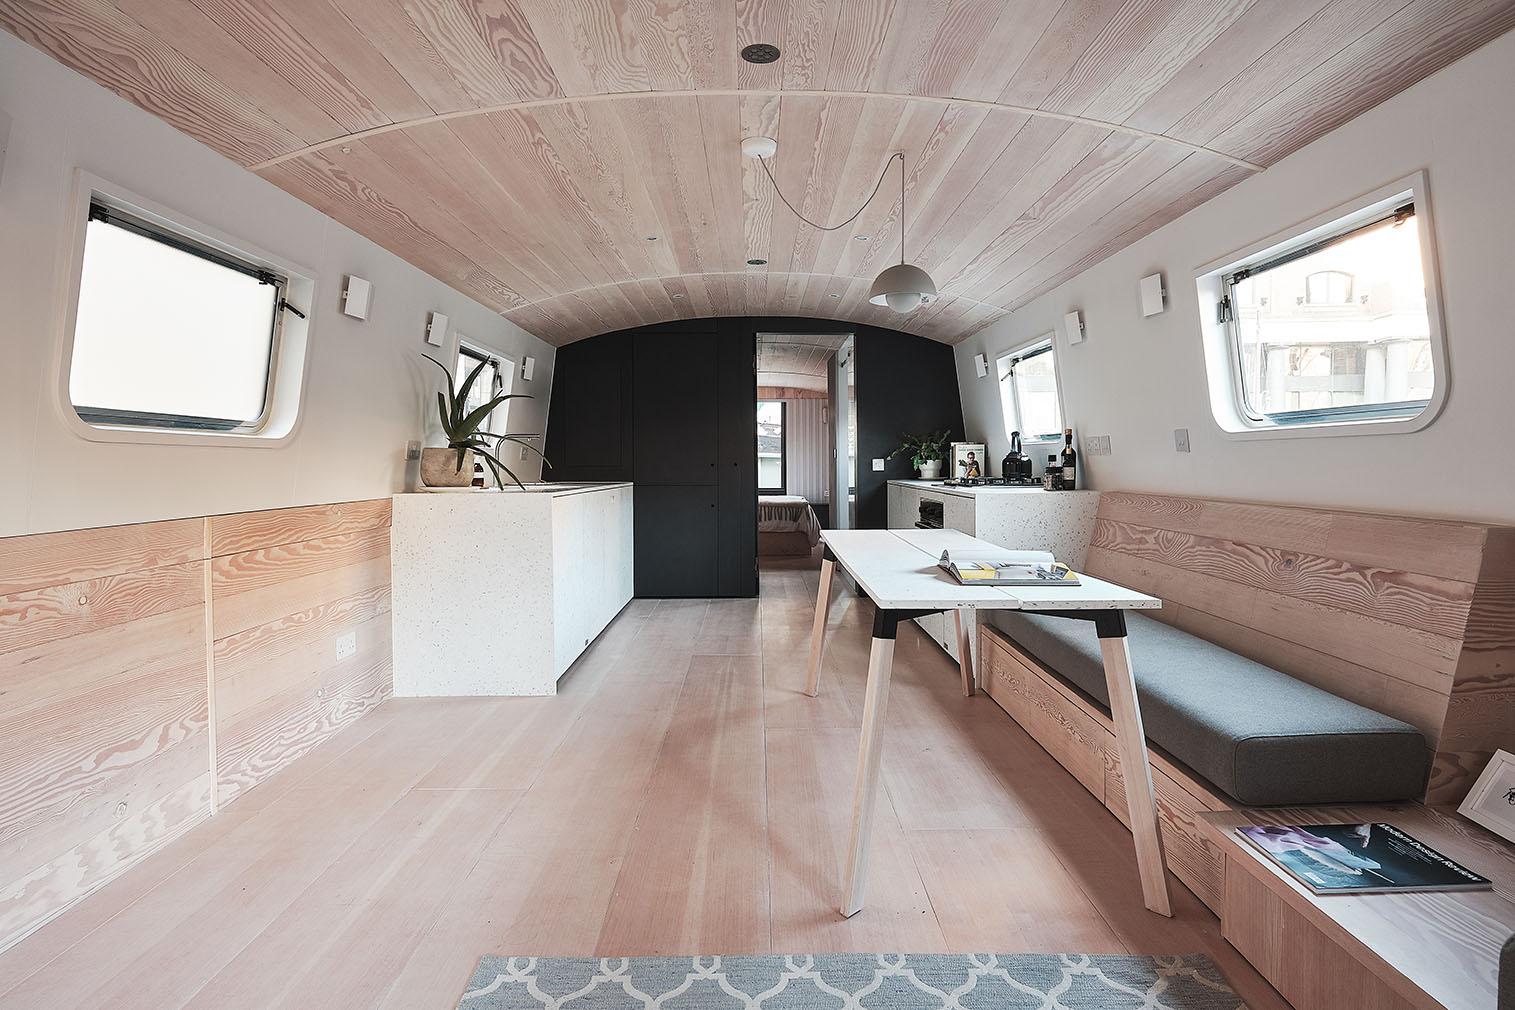 Dusky Parakeet minimalist barge for sale in East London